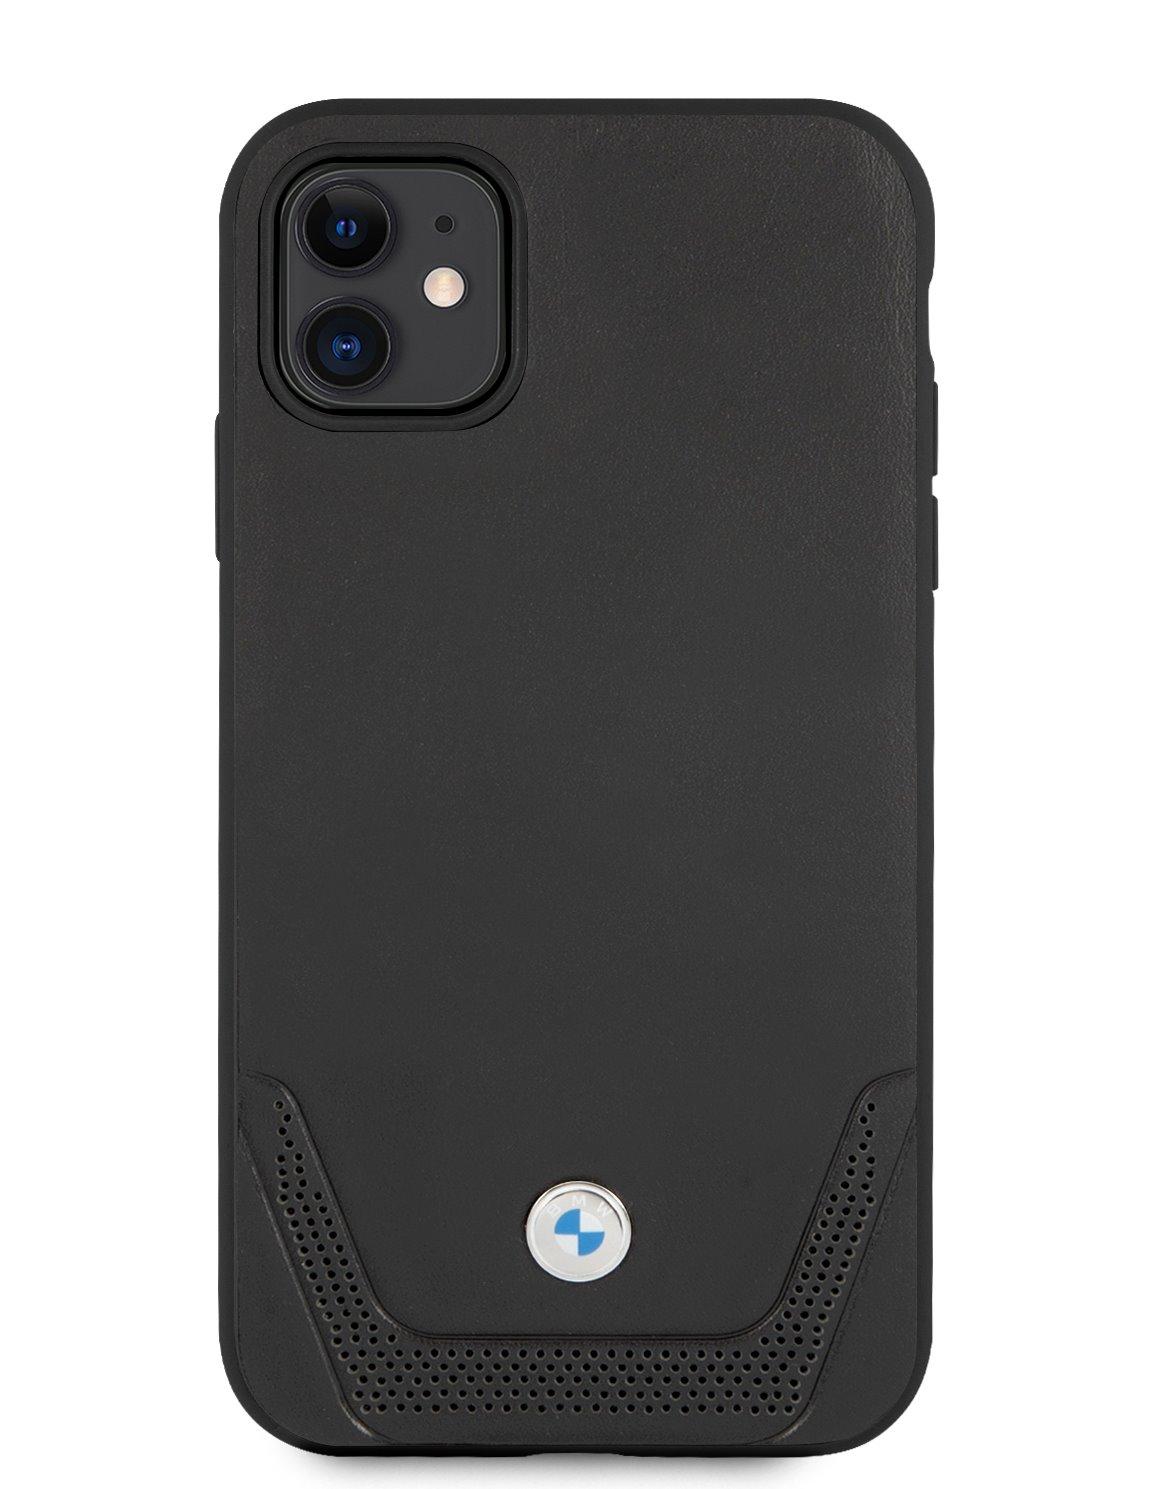 Ochranný kryt BMW Signature Leather Lower BMHCN61RSWPK Stripe pro Apple iPhone 11, černá